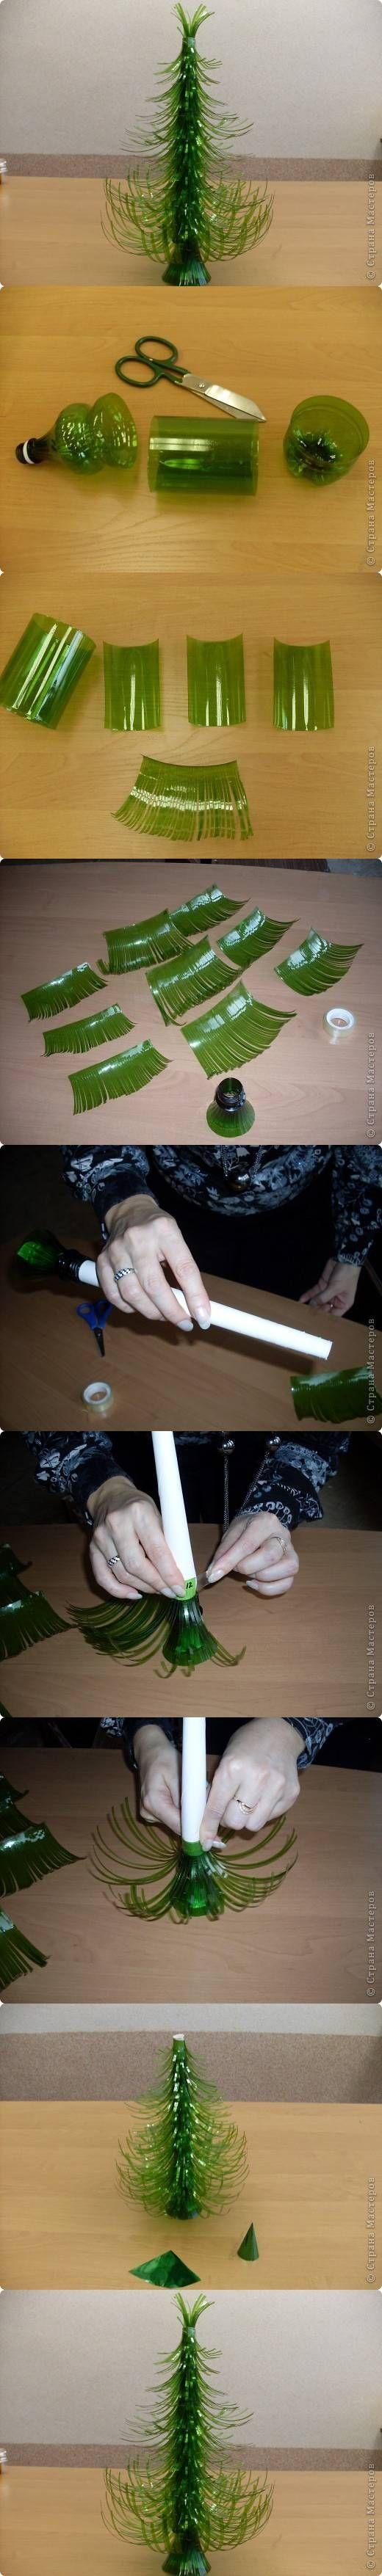 Елочки из бутылок своими руками